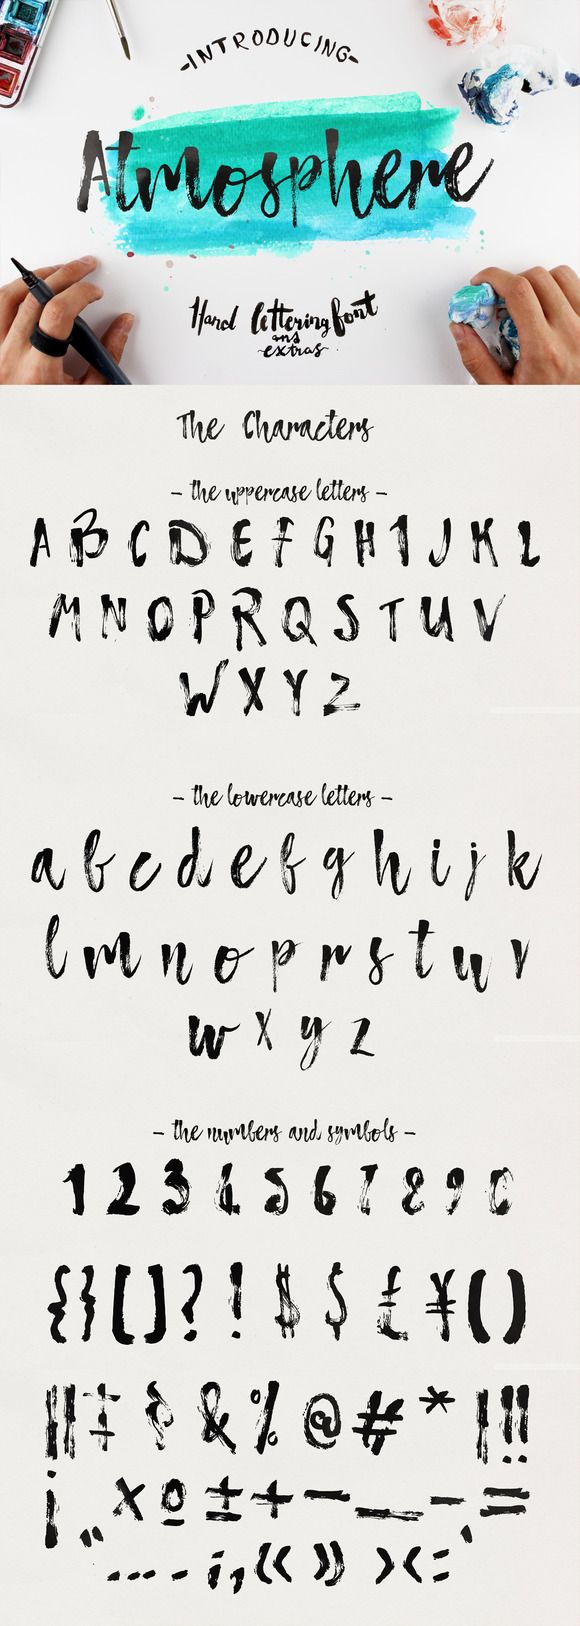 Atmosphere Script Typface by Yasir Ekinci. Handpainted modern calligraphy font.